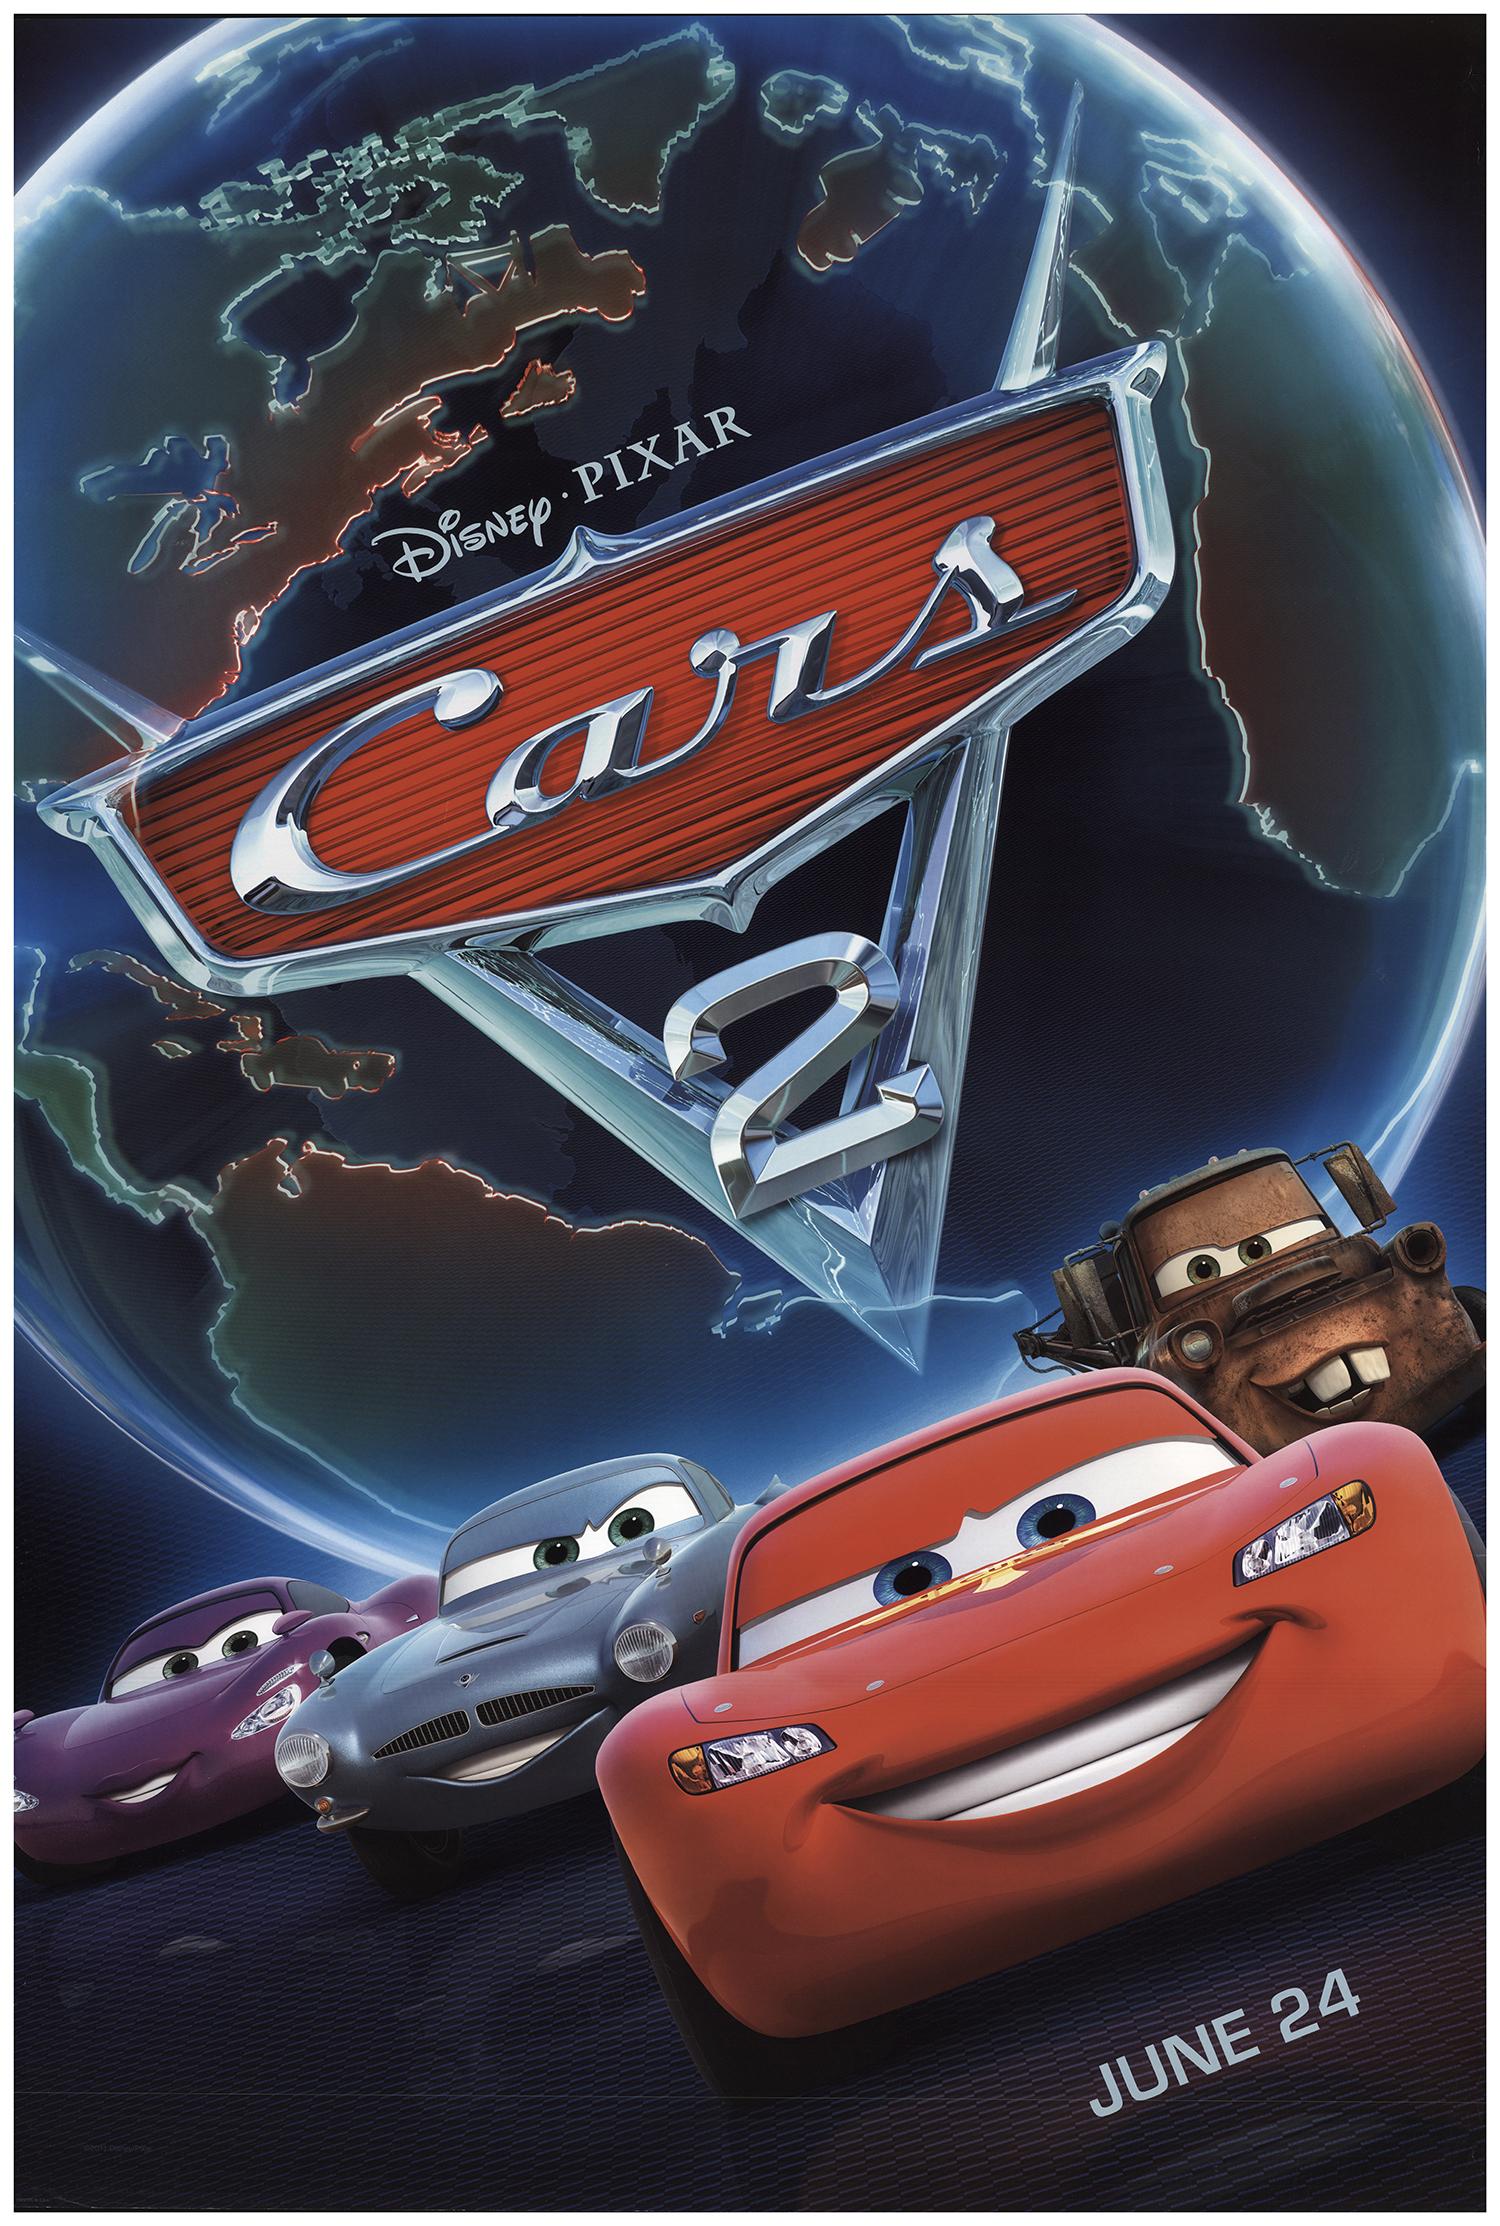 Cars 2 2011 Original Movie Poster Fff 74119 Fffmovieposters Com